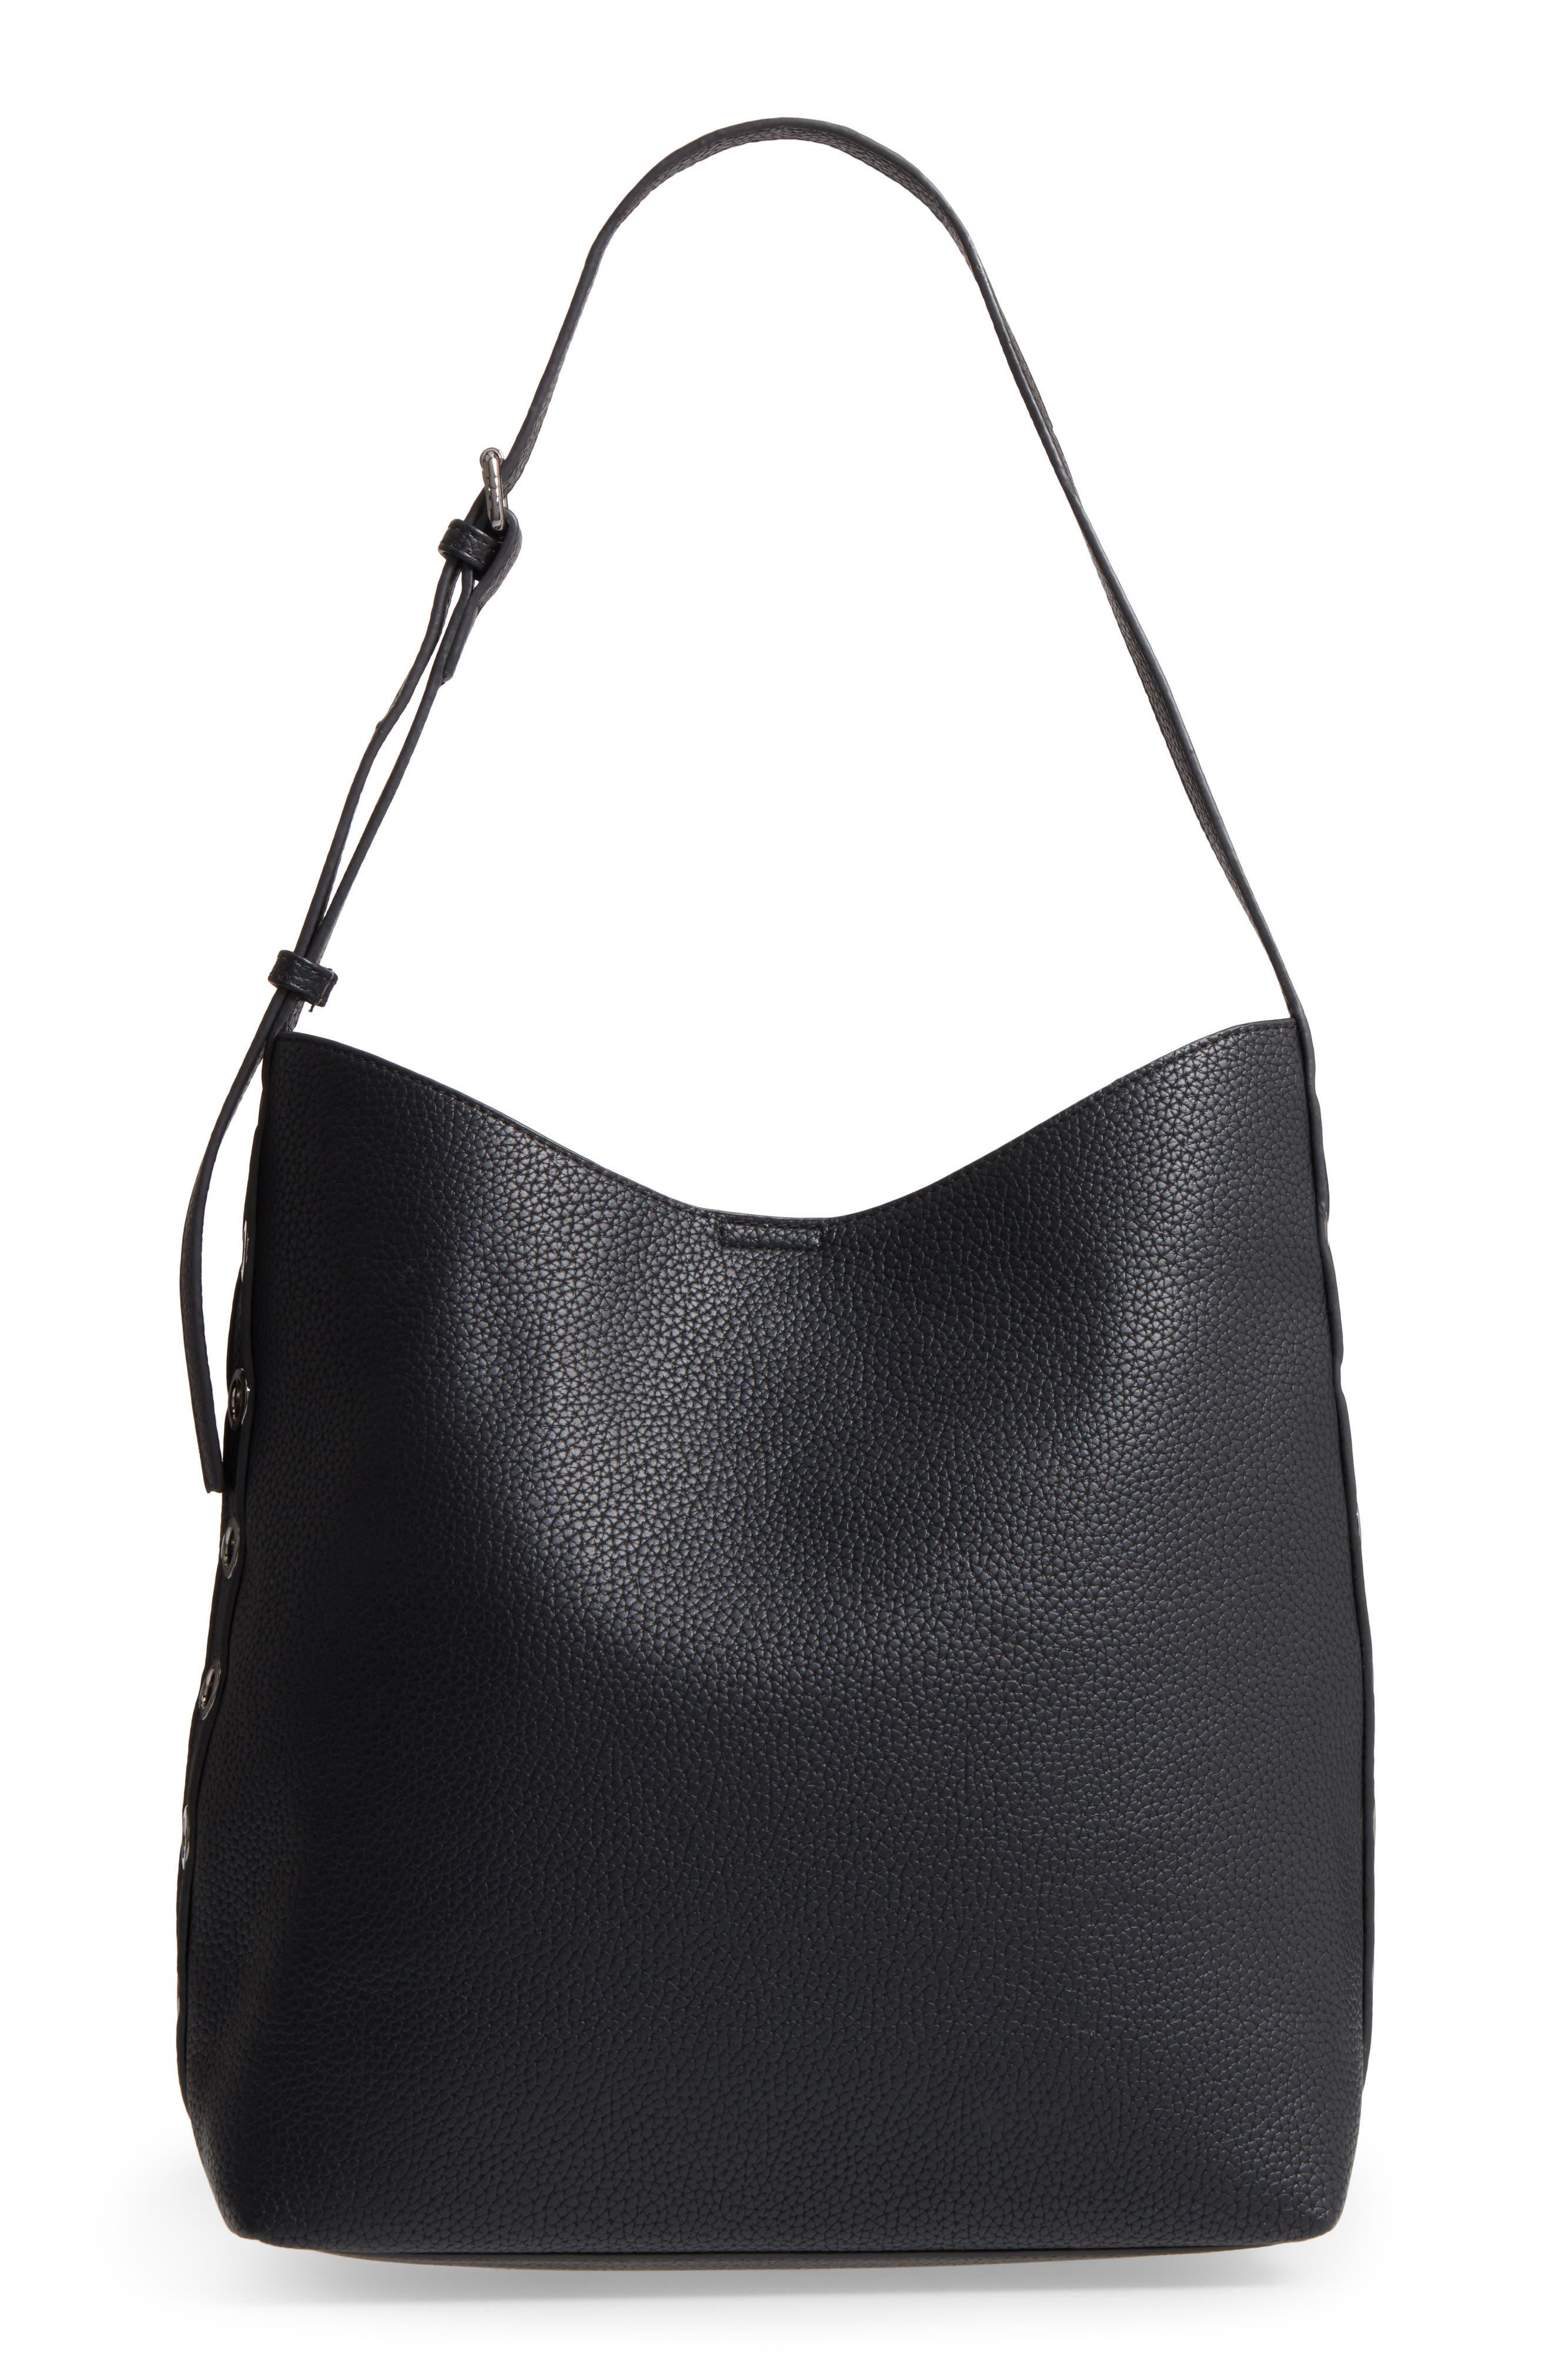 Samara Faux Leather Shoulder Bag,                             Main thumbnail 1, color,                             001